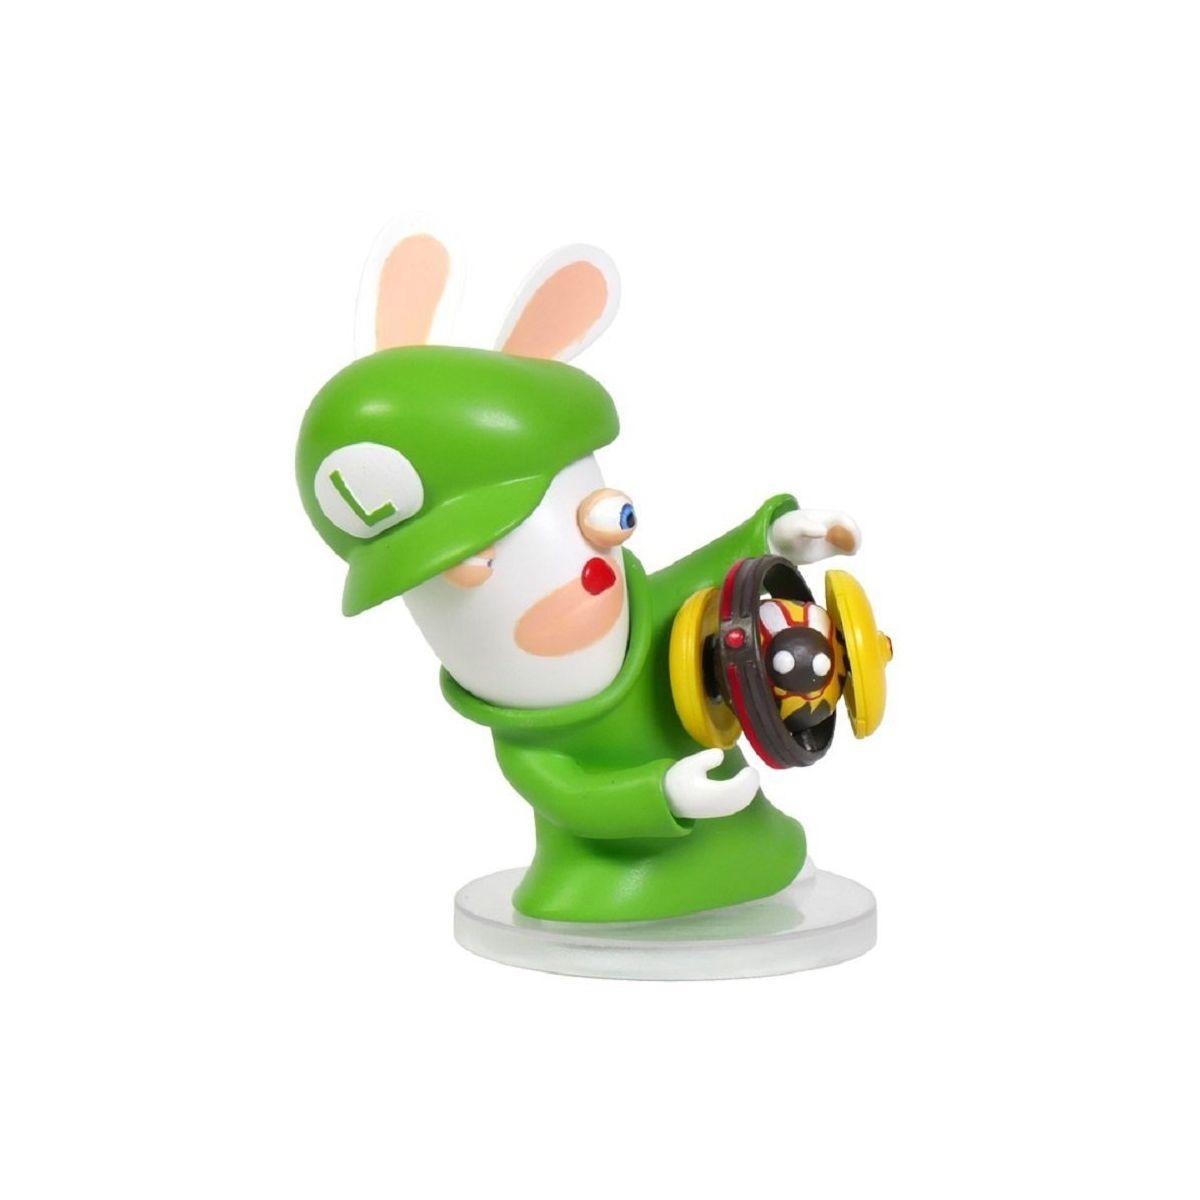 Figurine UBISOFT Mario + Lapins Crétins - Luigi 8cm (photo)